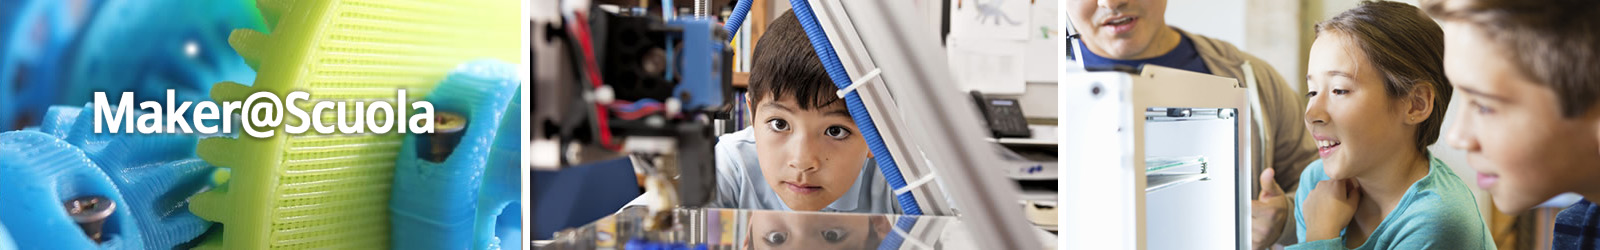 maker a scuola, stampati 3d